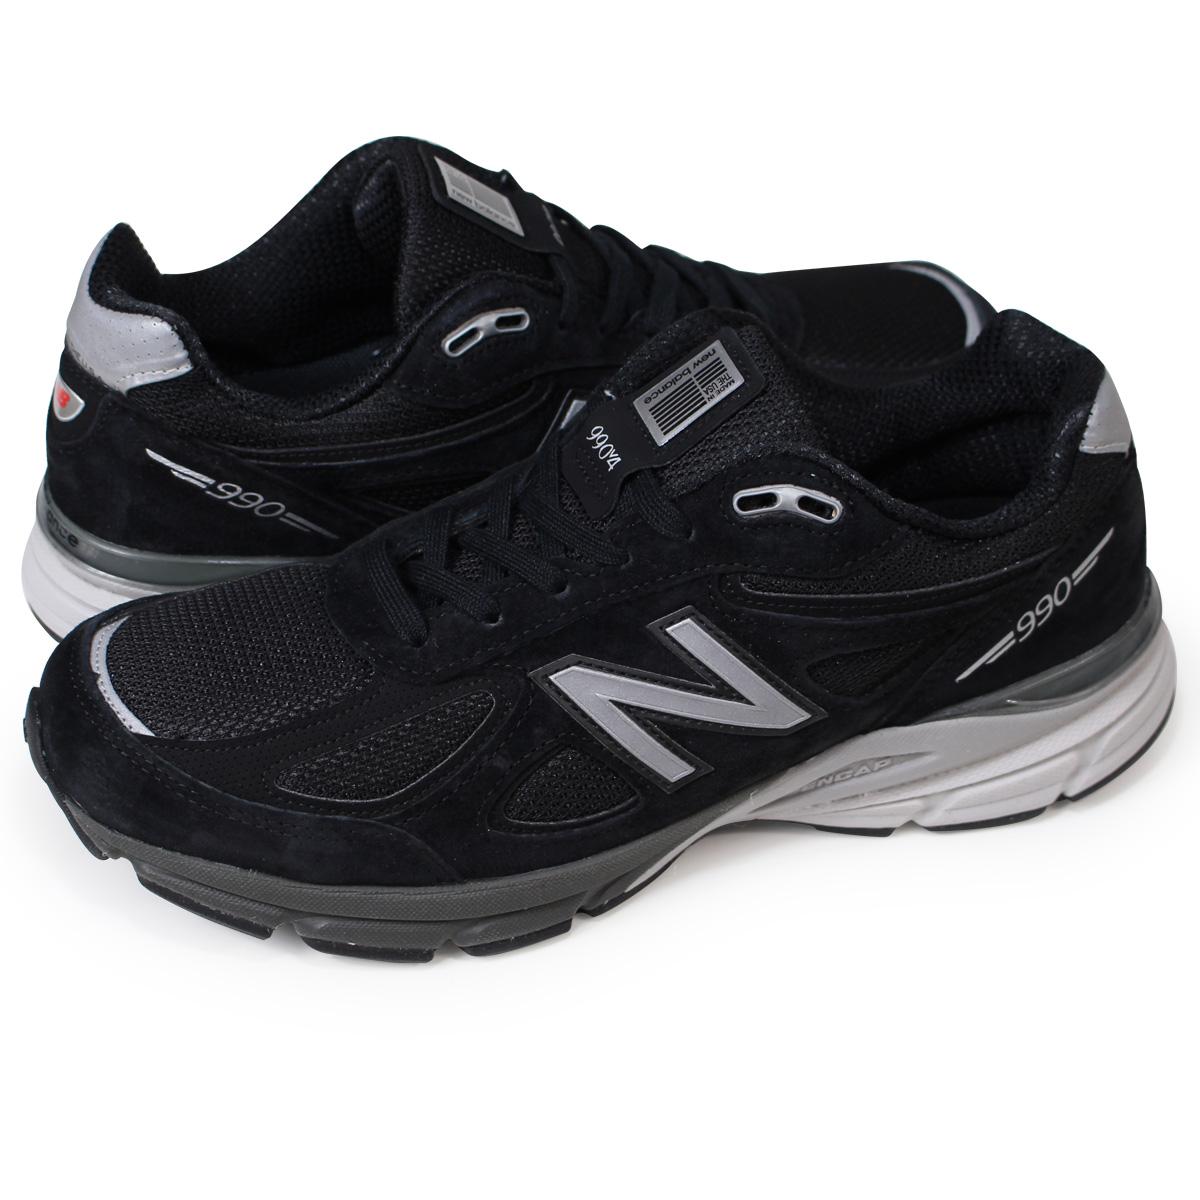 Whats up Sports   Rakuten Global Market: New Balance 990 men's new balance sneakers M990BK4 D Wise MADE IN USA shoes black [7/19 Shinnyu load]